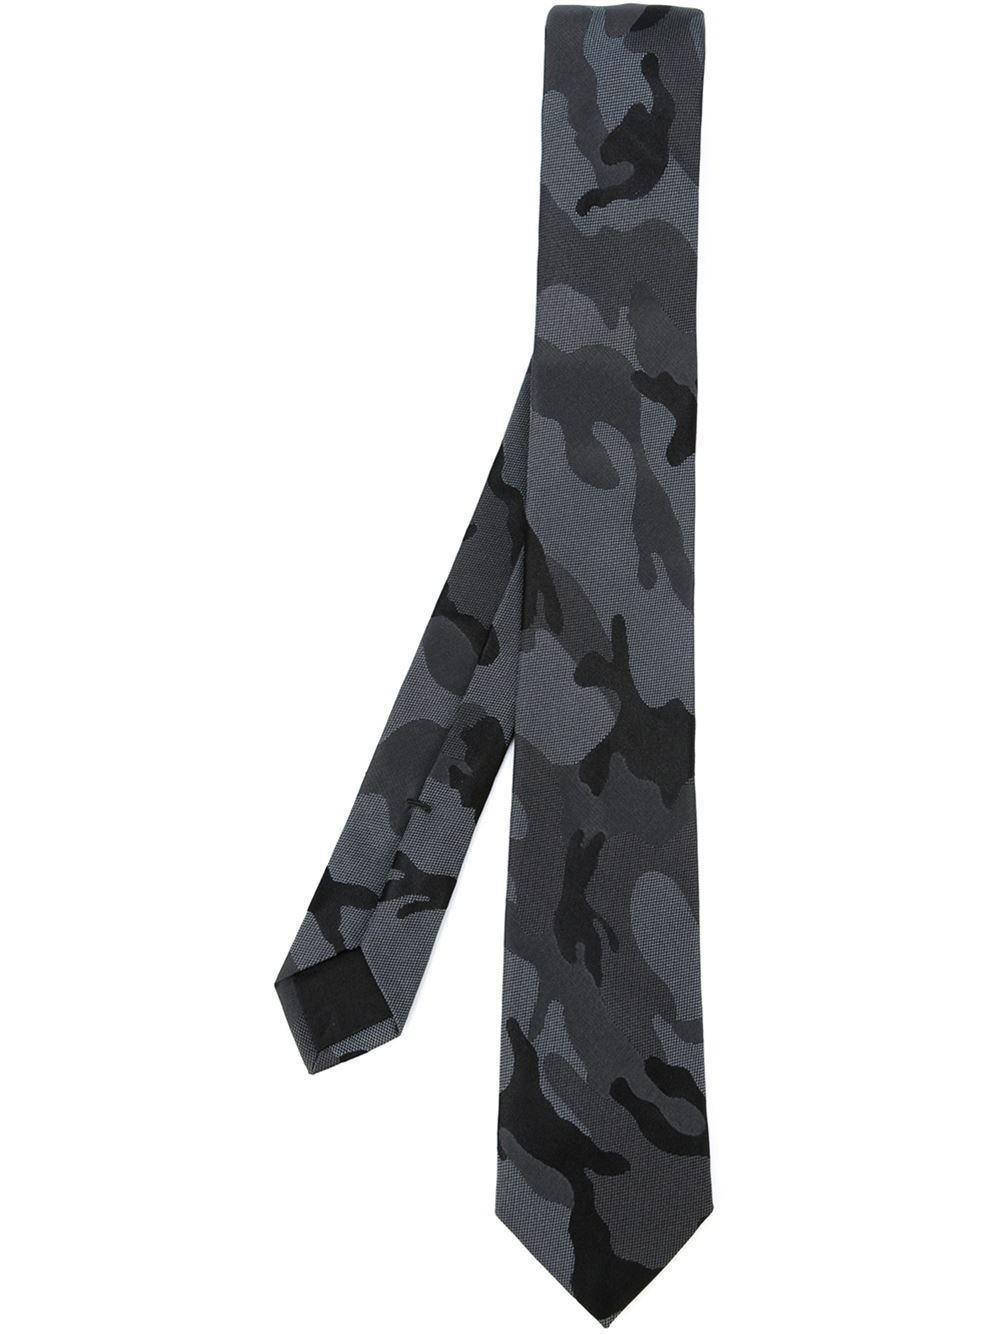 136bb74cf492 Valentino Garavani Camouflage Tie in Gray for Men - Lyst